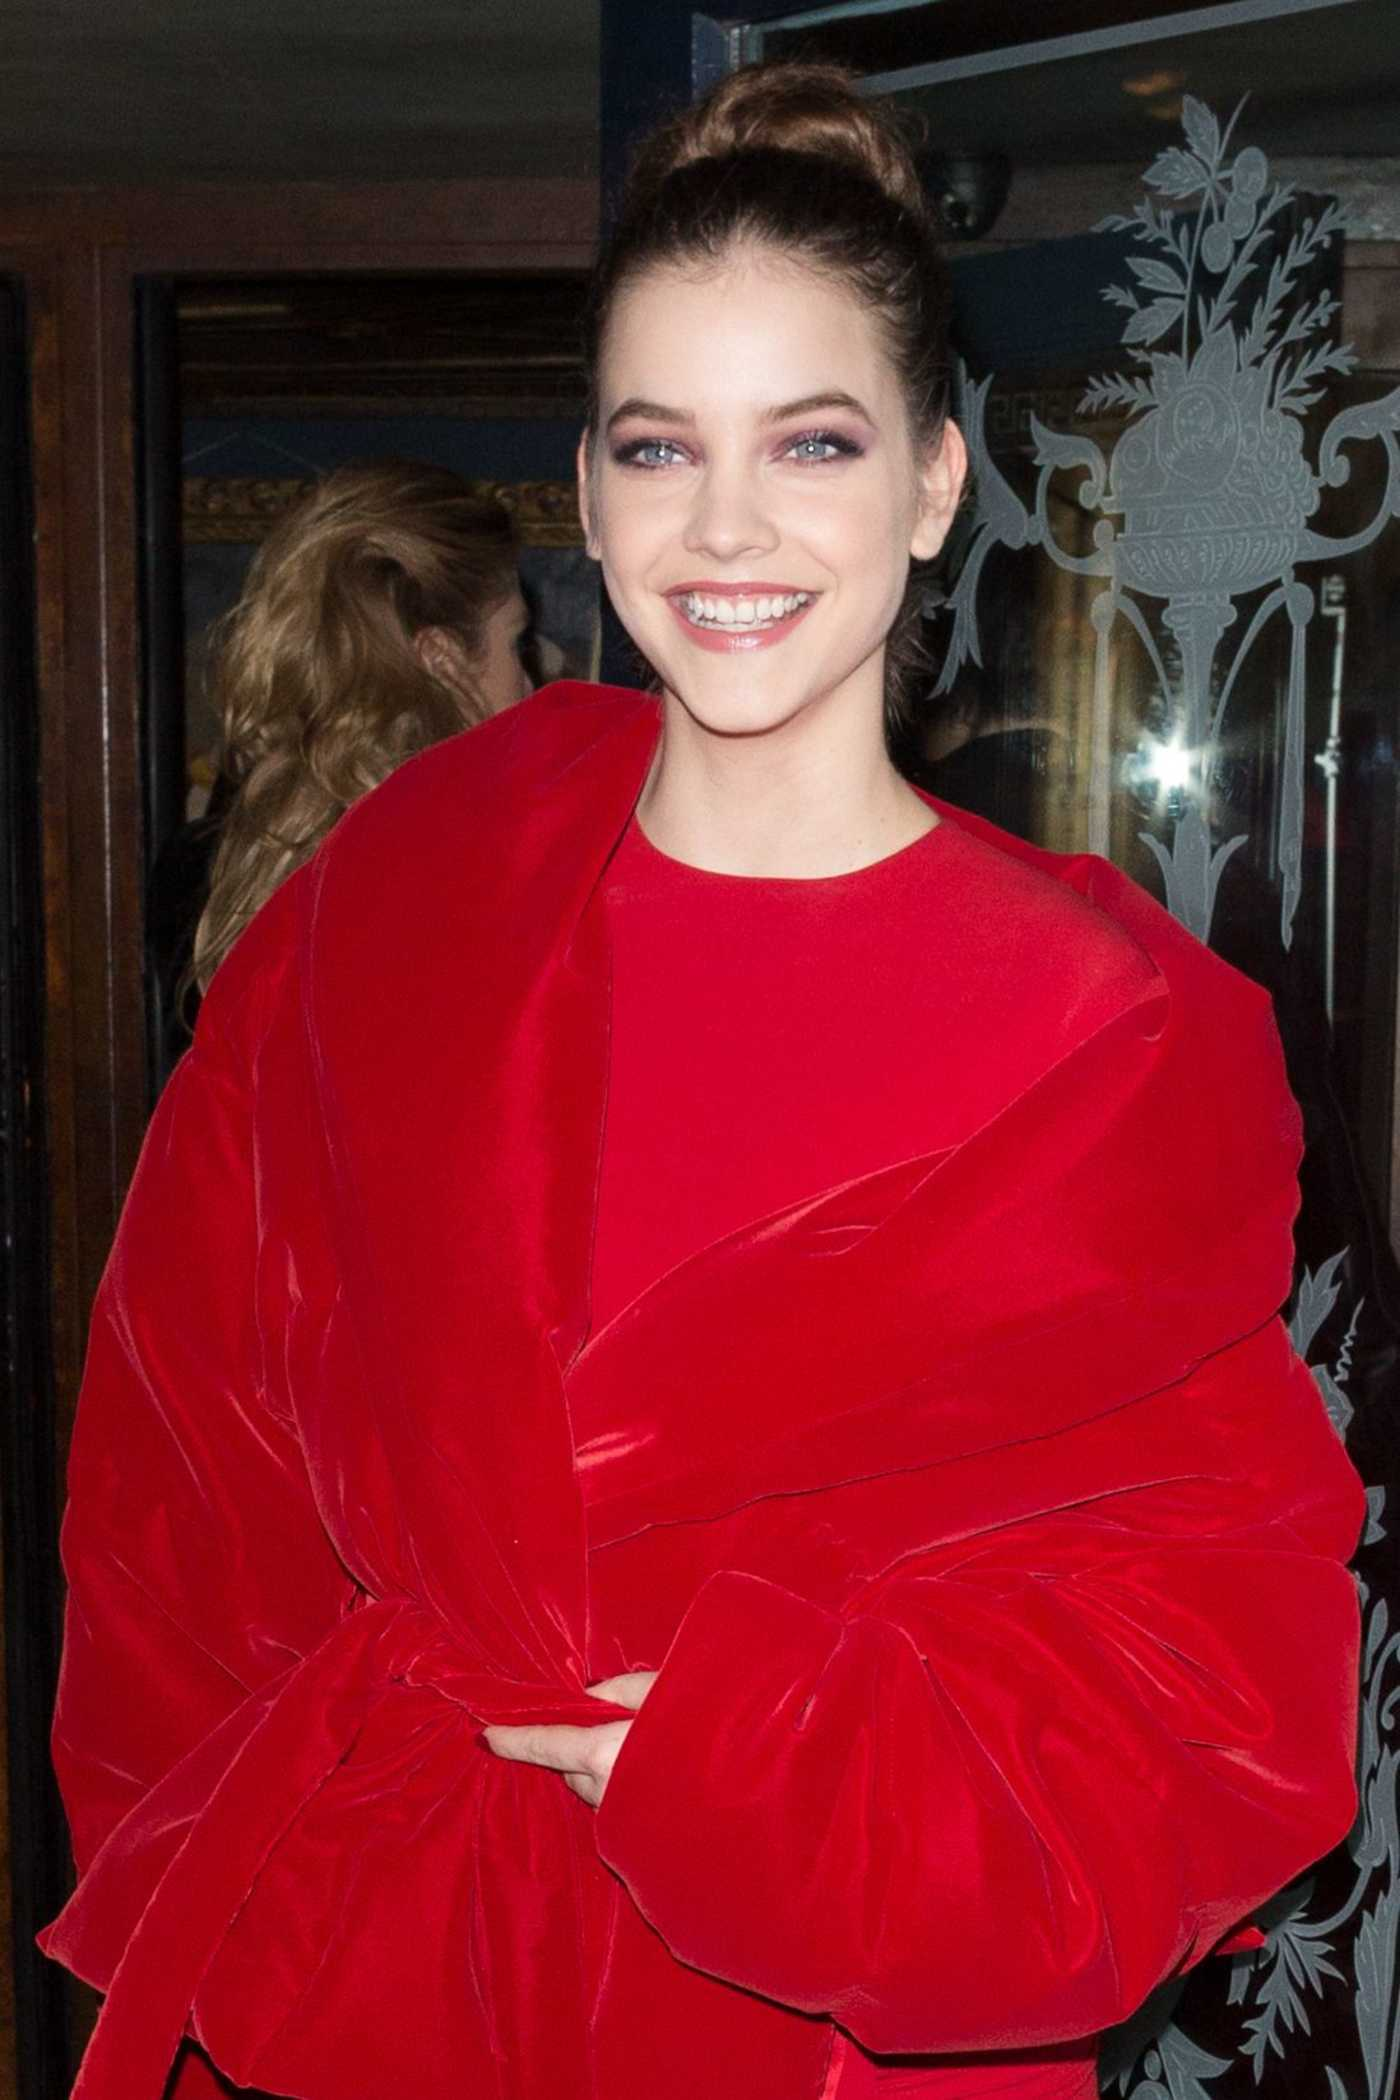 Barbara Palvin at the V Magazine Party in Paris 03/07/2017